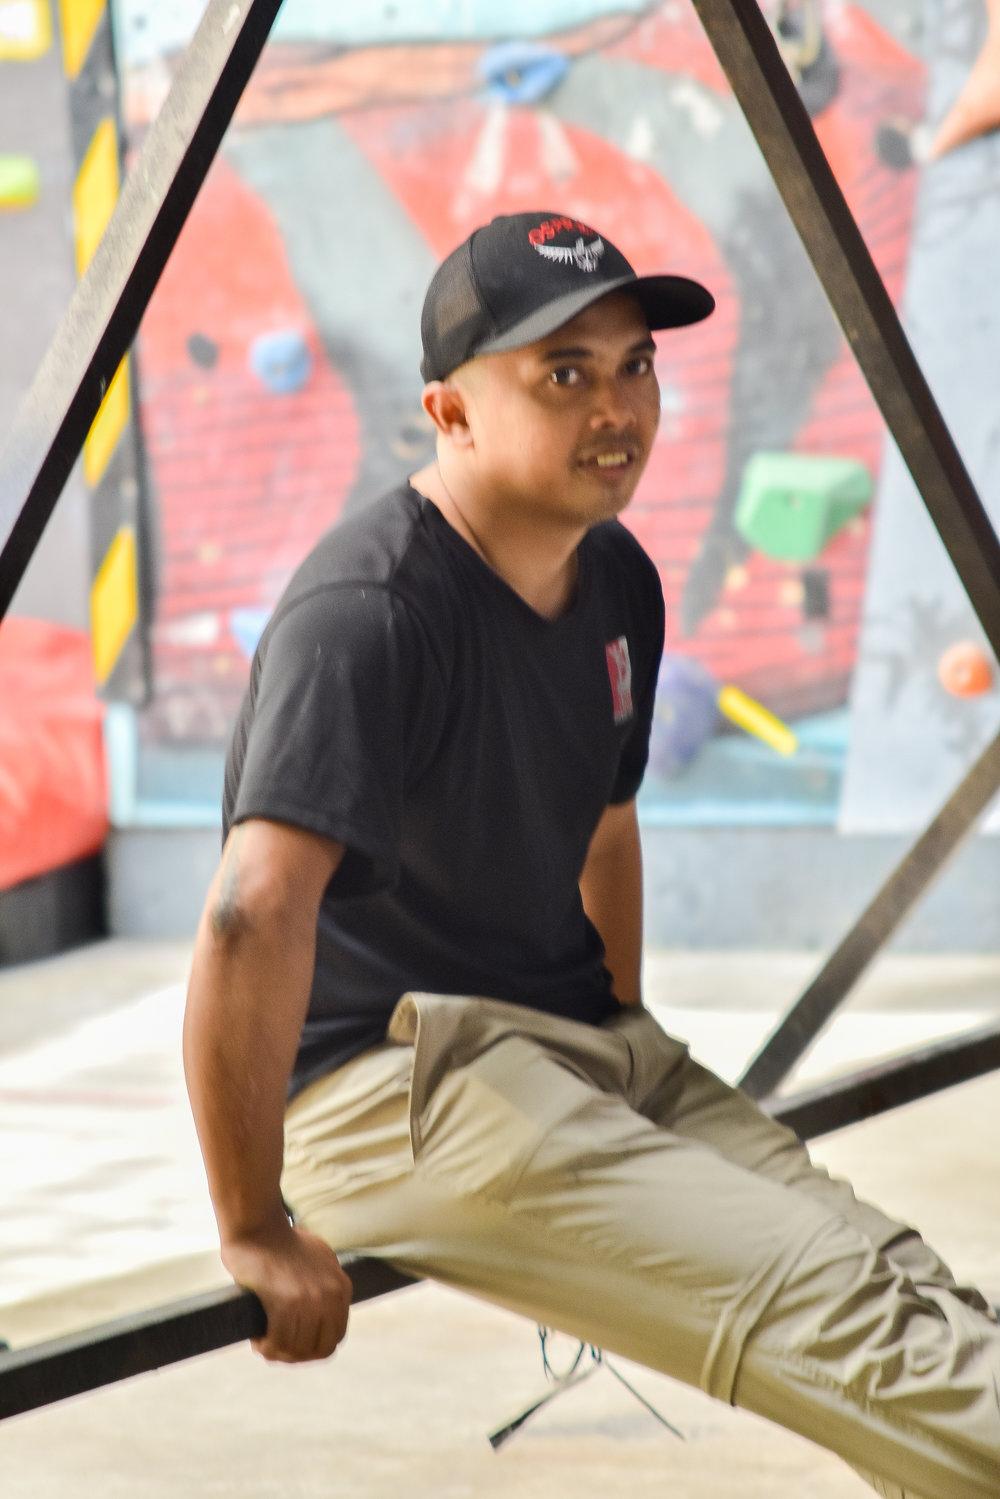 Jun wants you to train like a pro